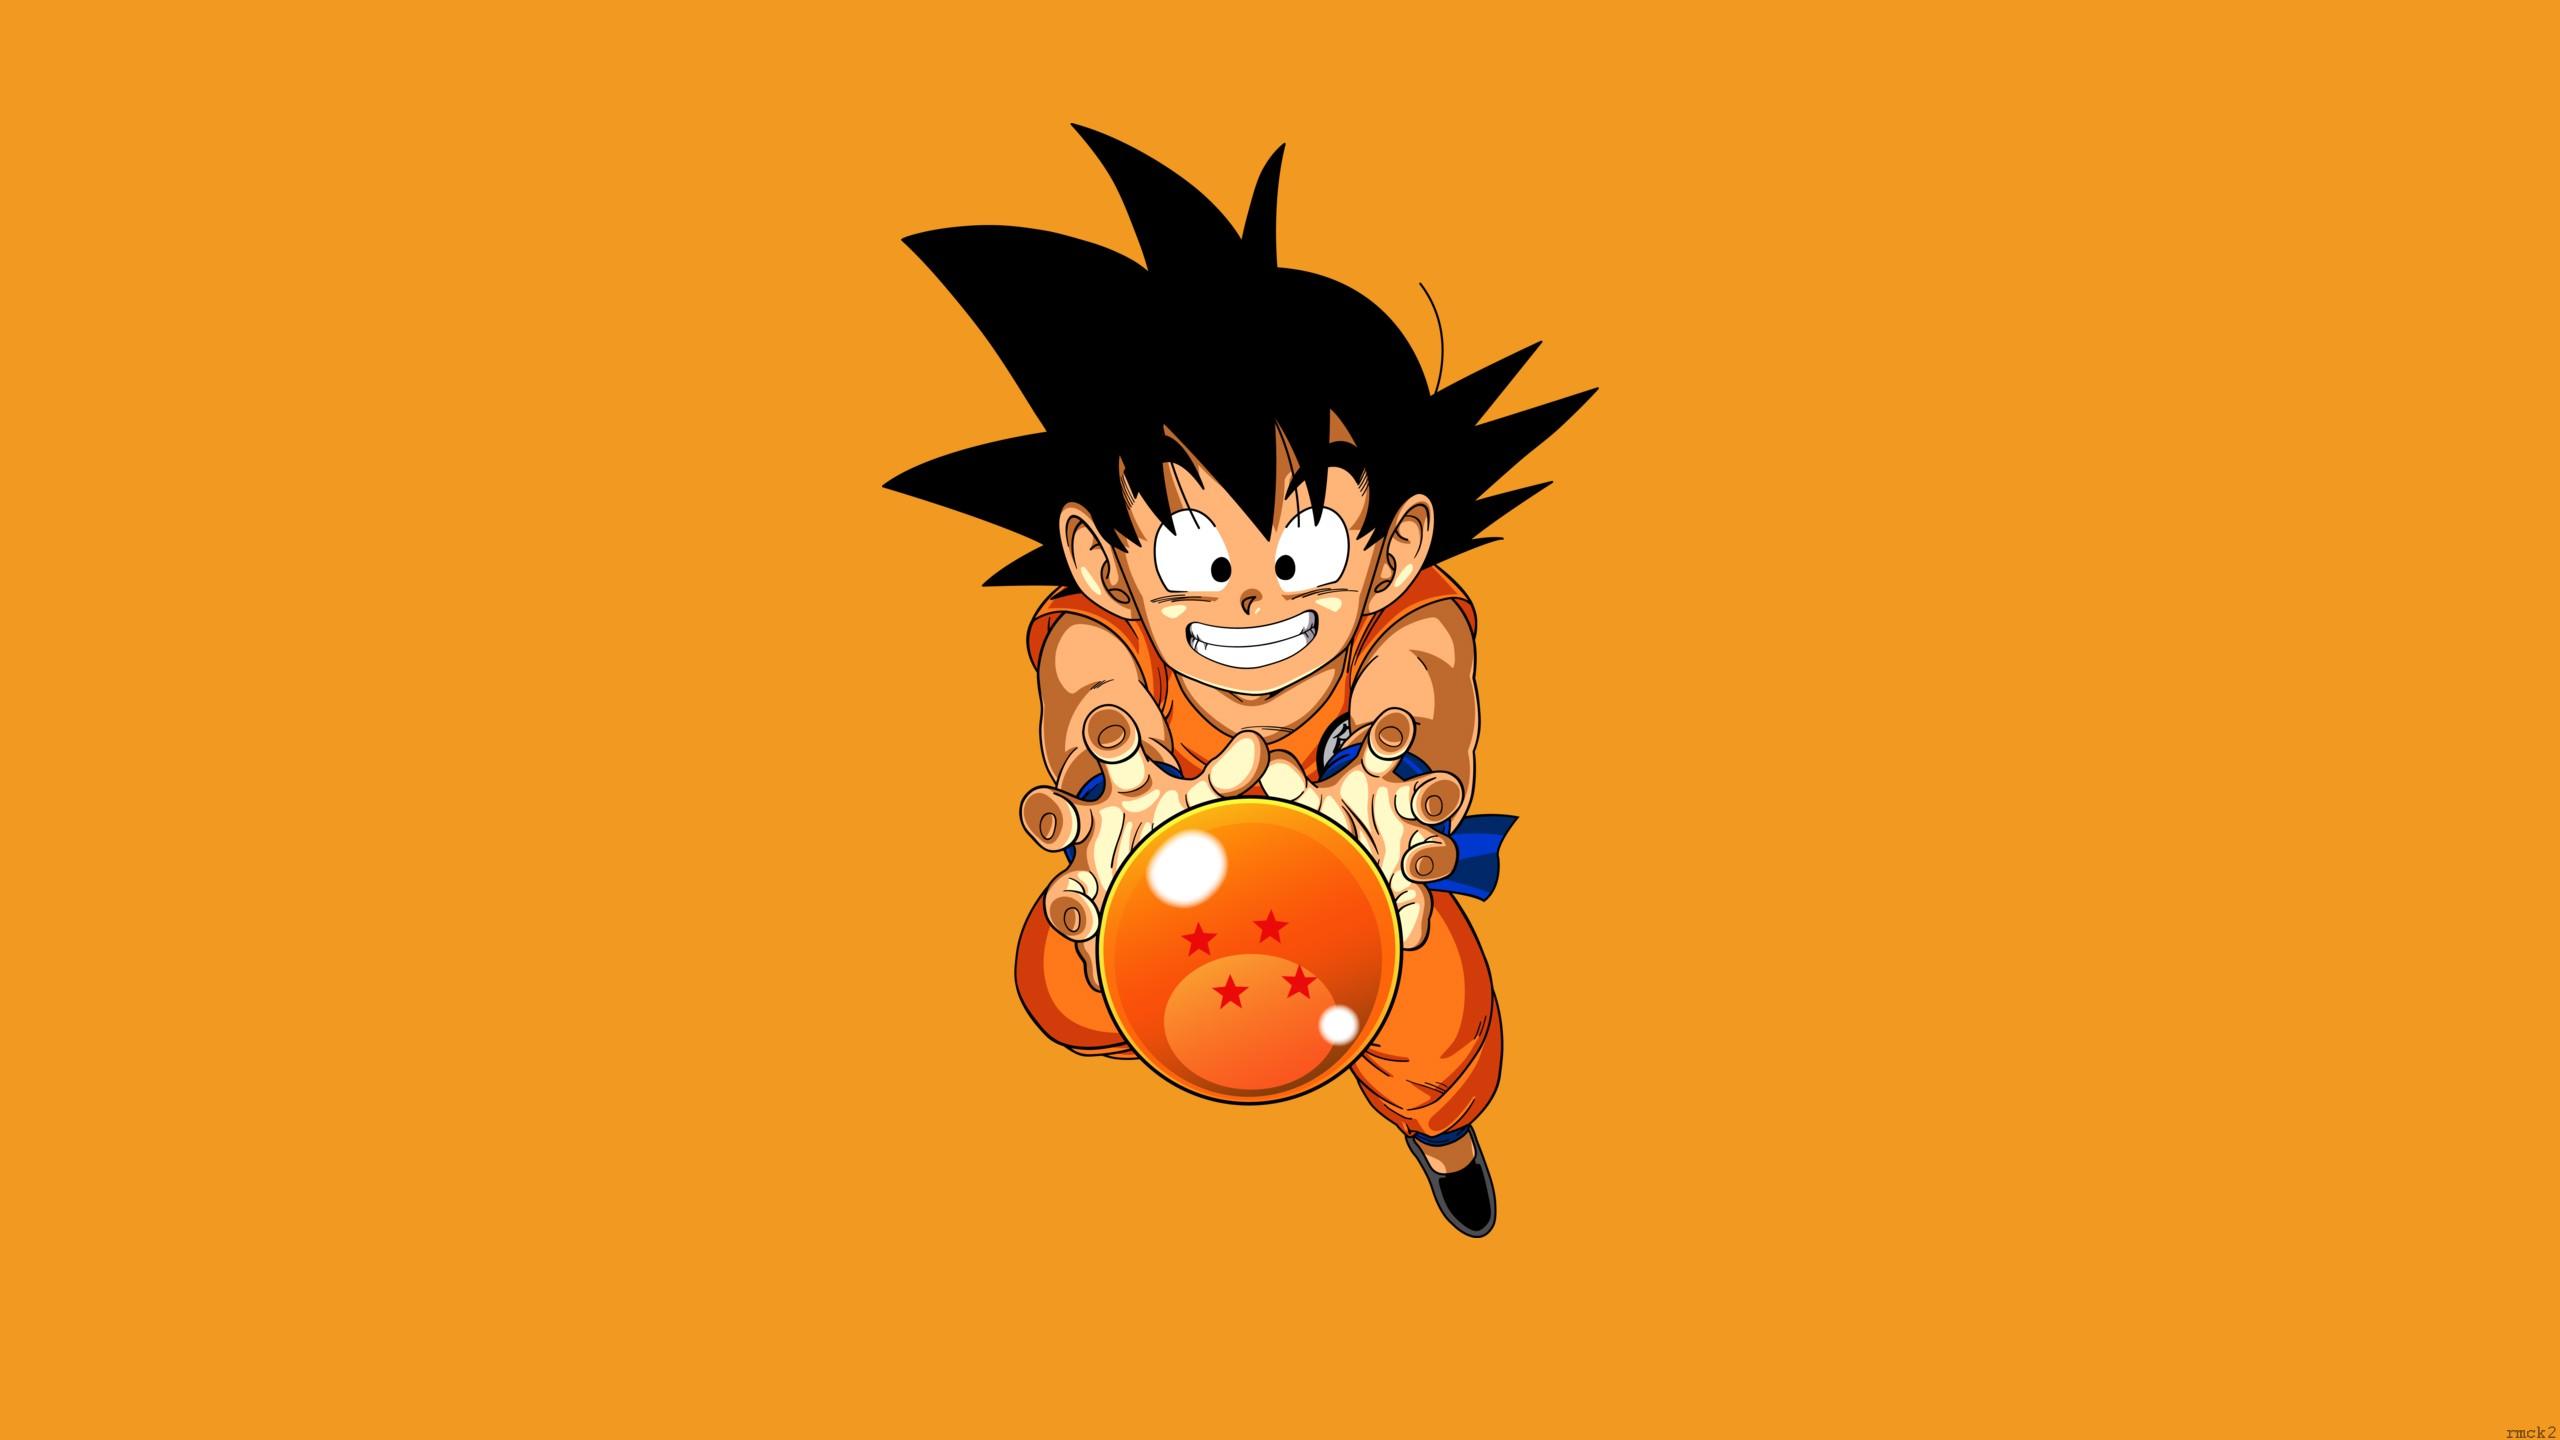 Illustration Anime Cartoon Dragon Ball Son Goku Z Kid Screenshot